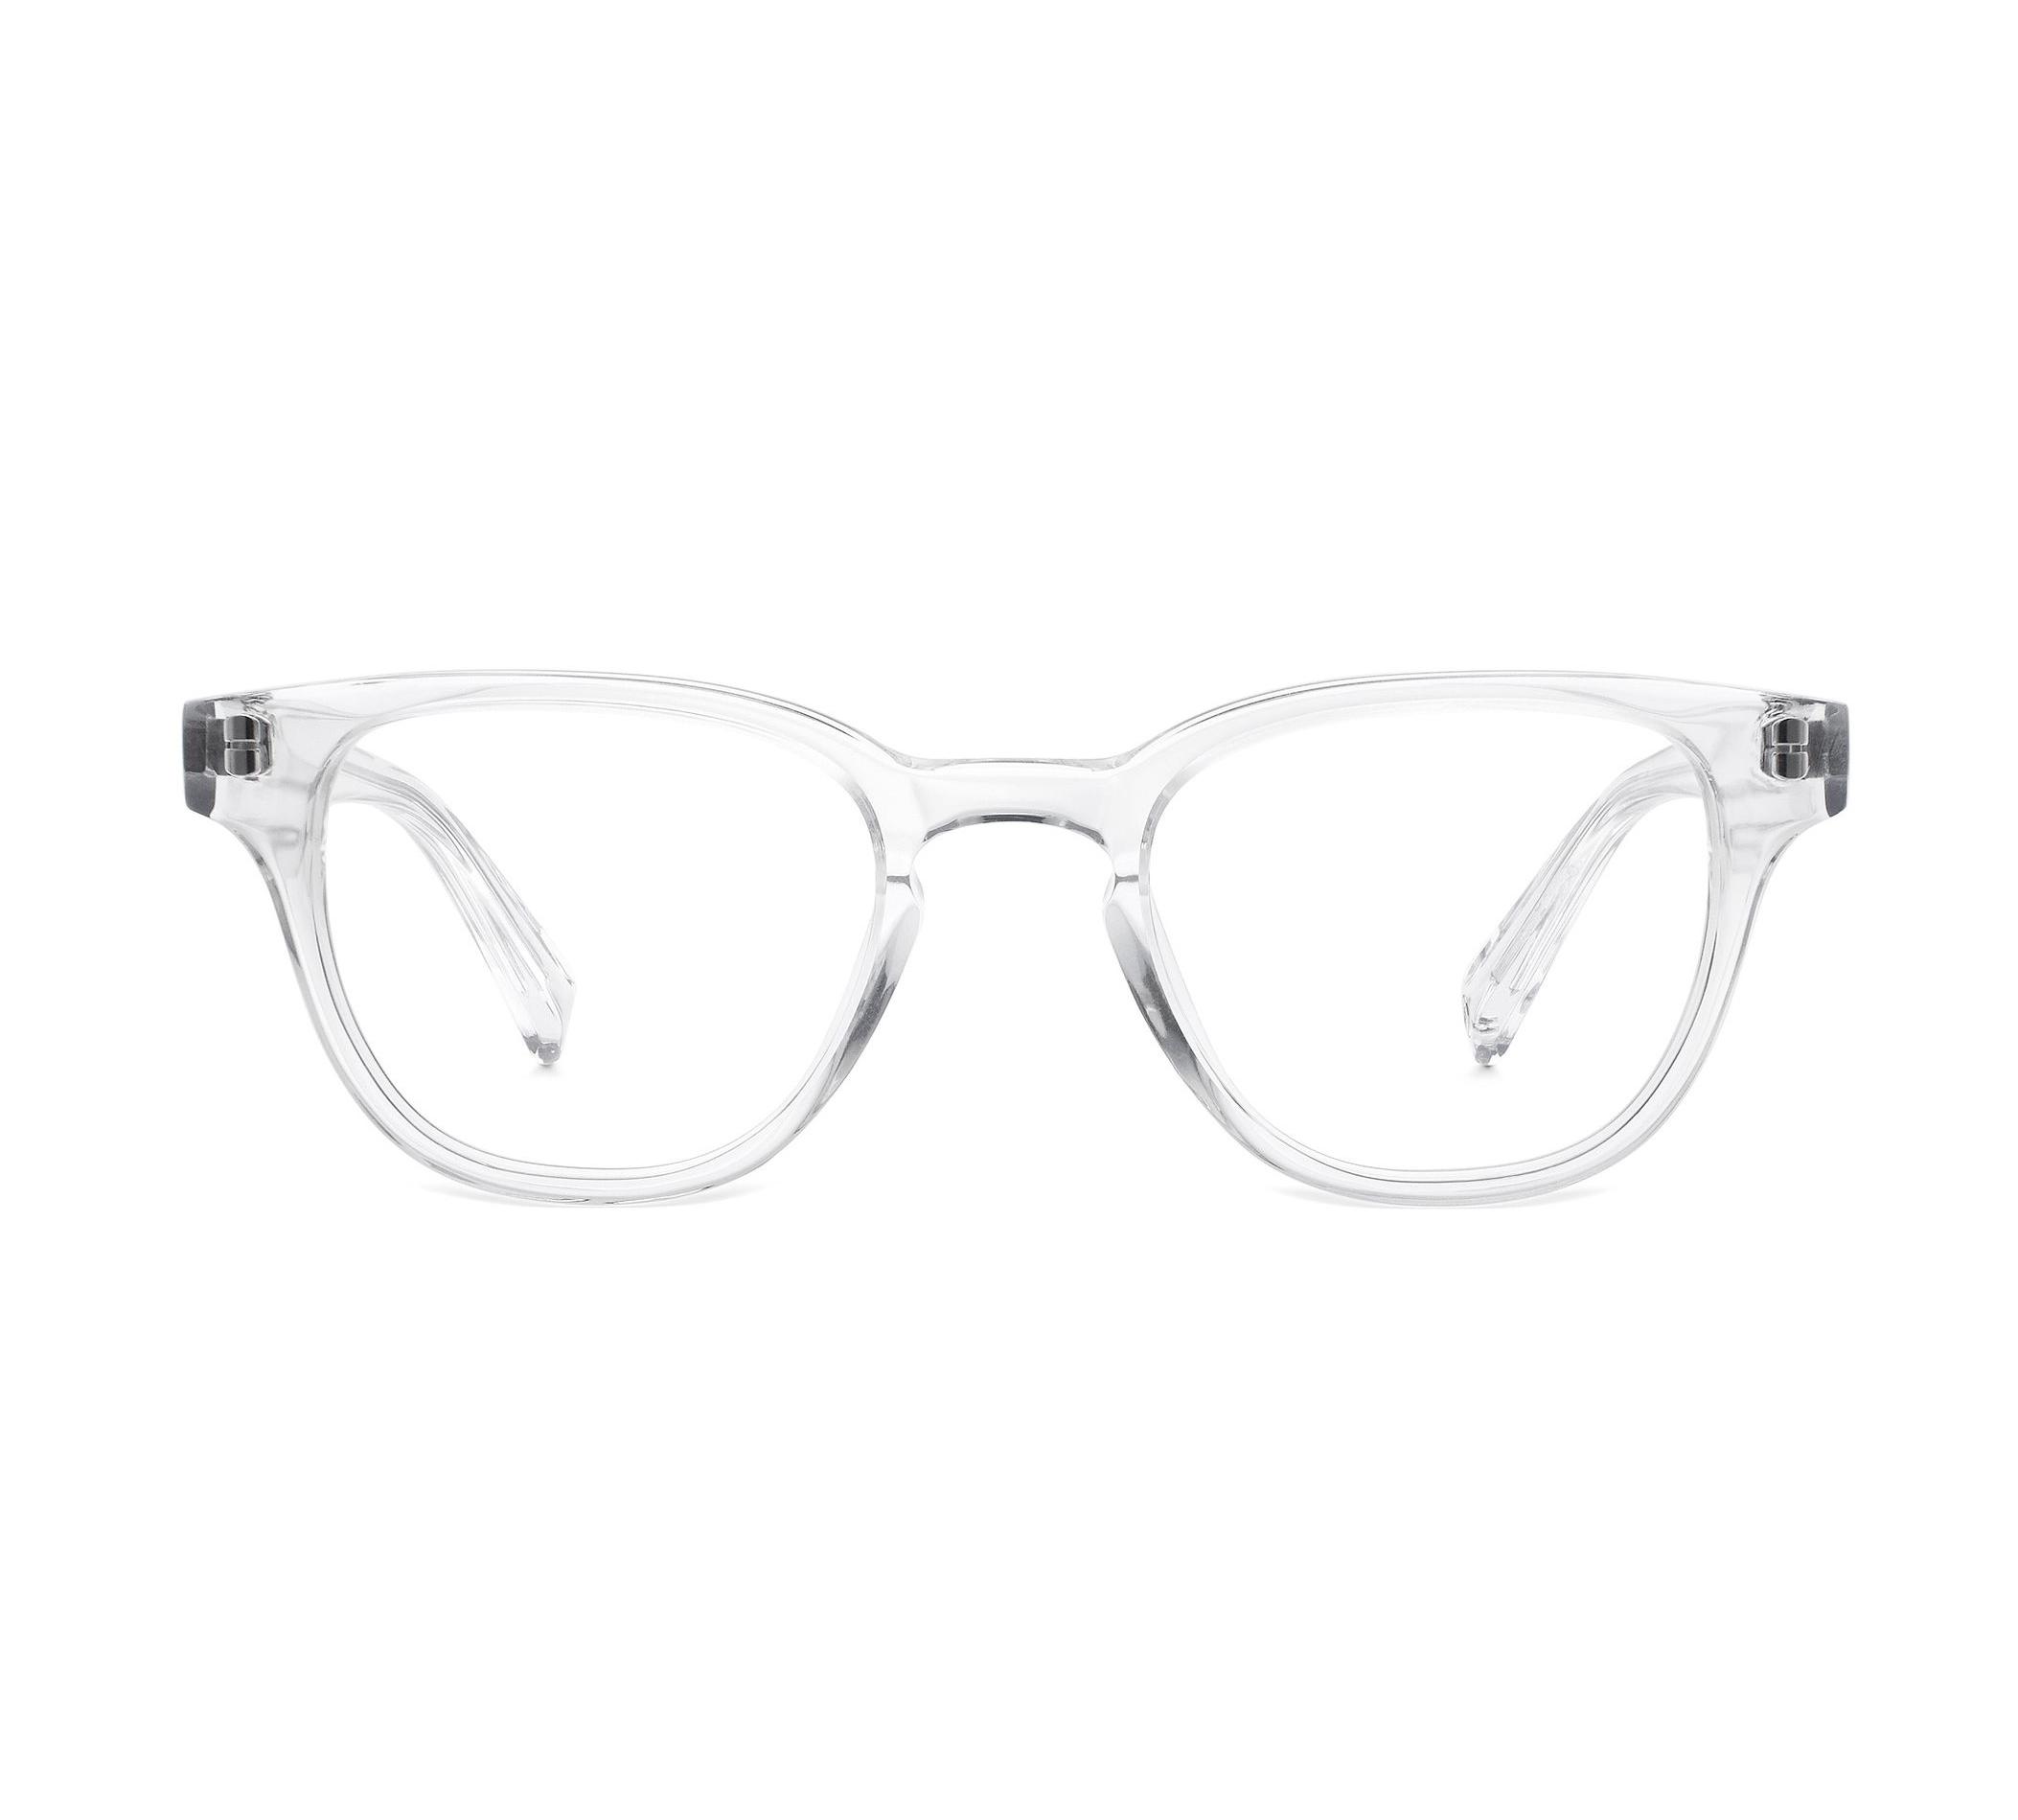 Kylie Jenner Wears Clear Frame Glasses: Similar Styles